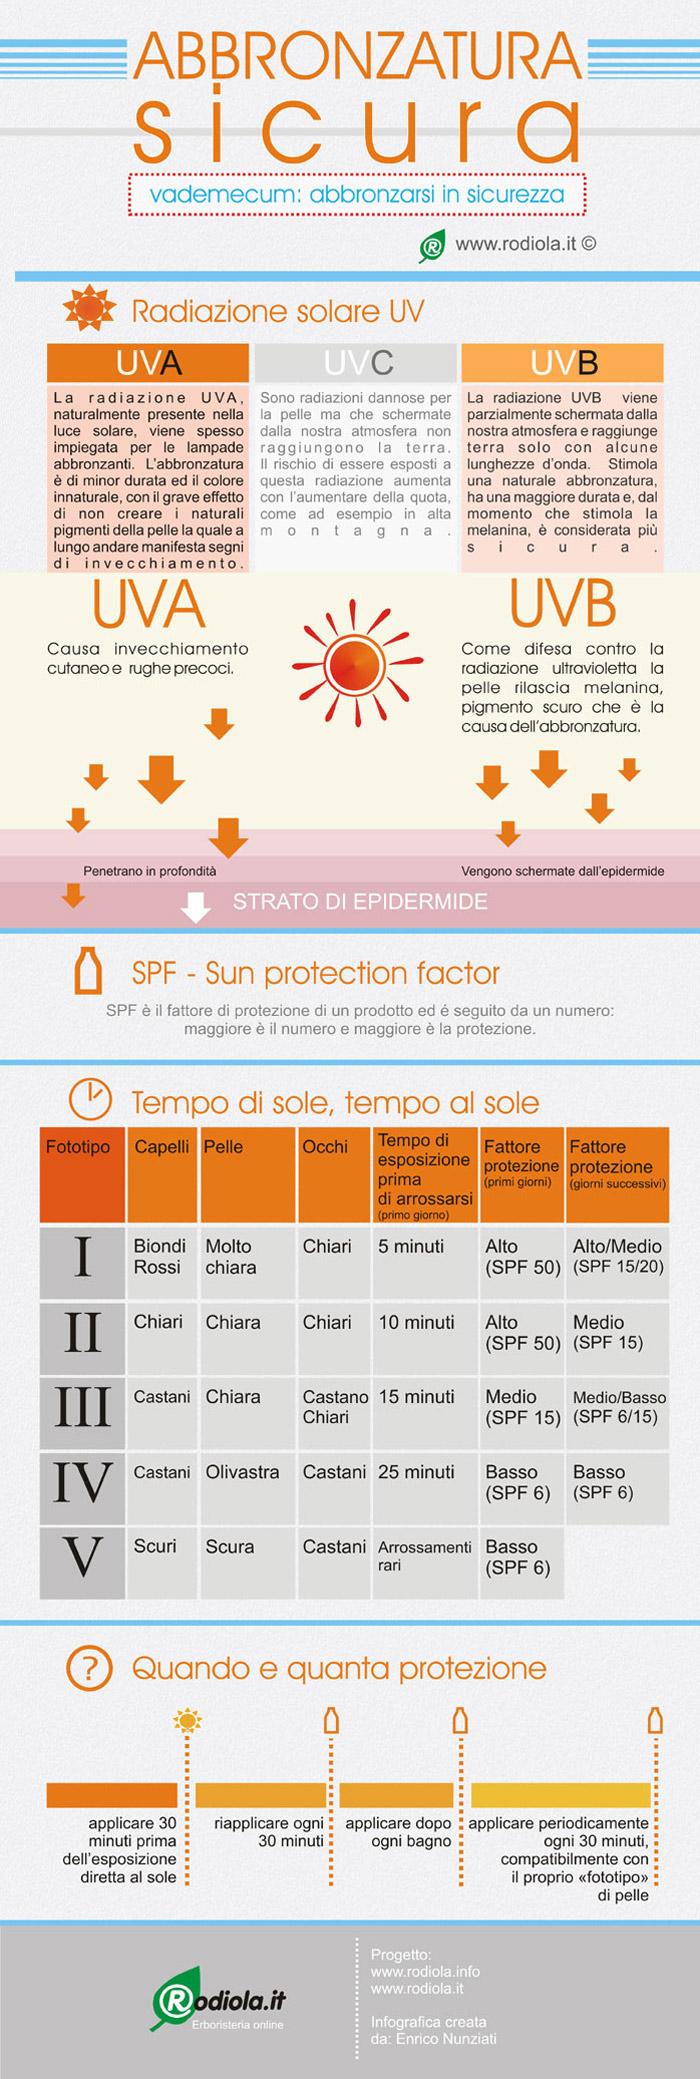 abbronzatura betacarotene infografica